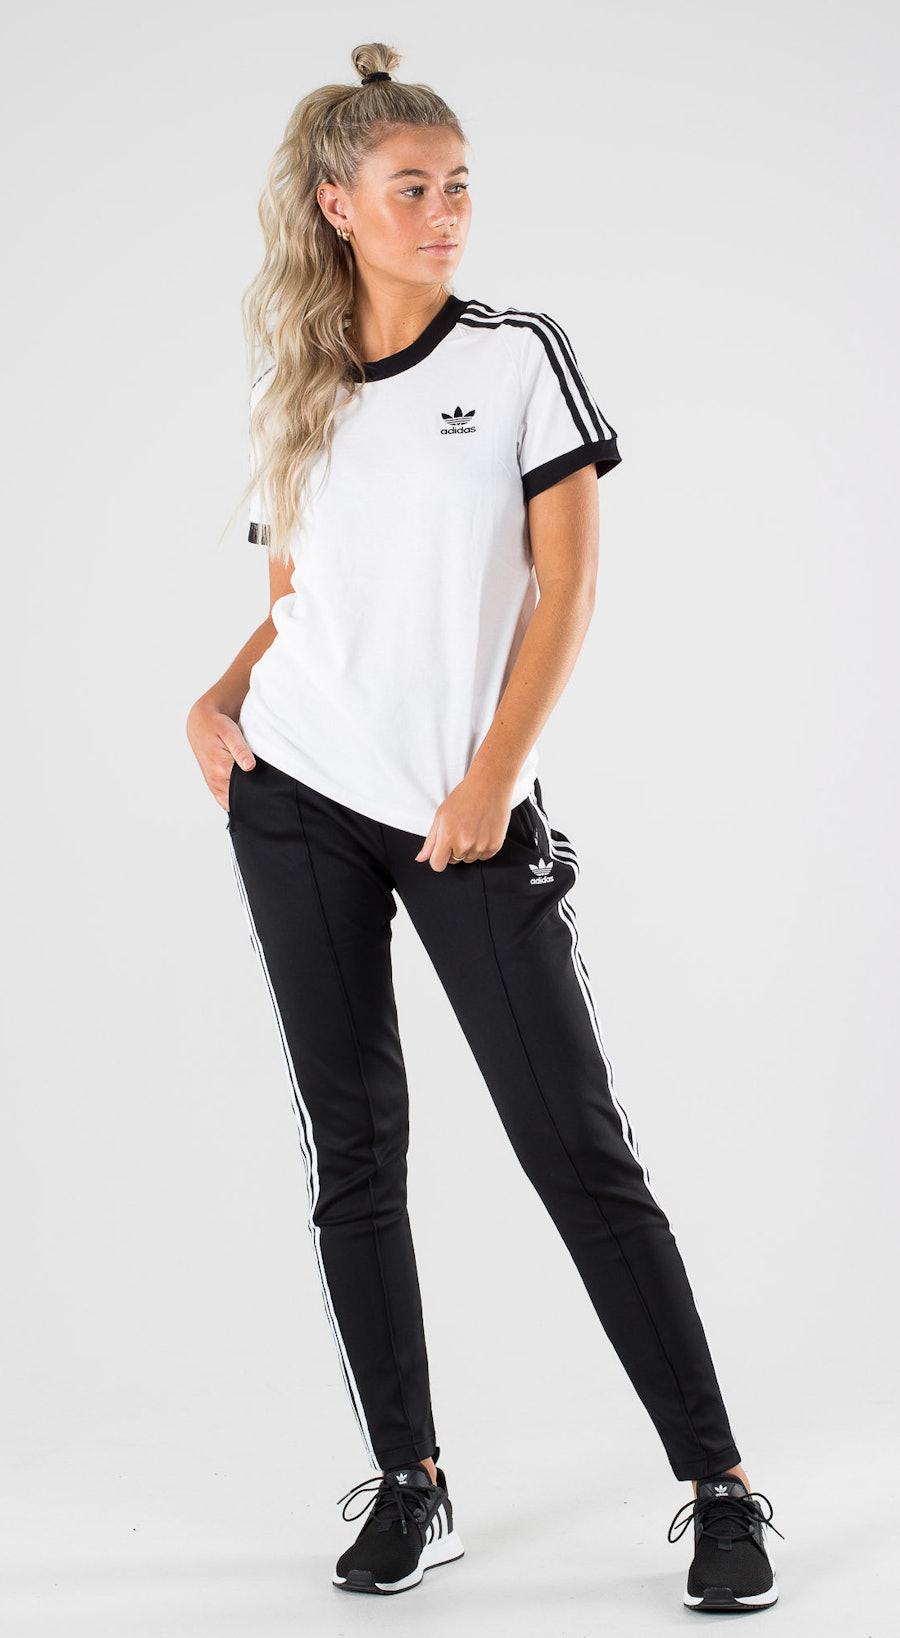 Adidas Originals 3 Stripe Tee White Black Outfit Multi